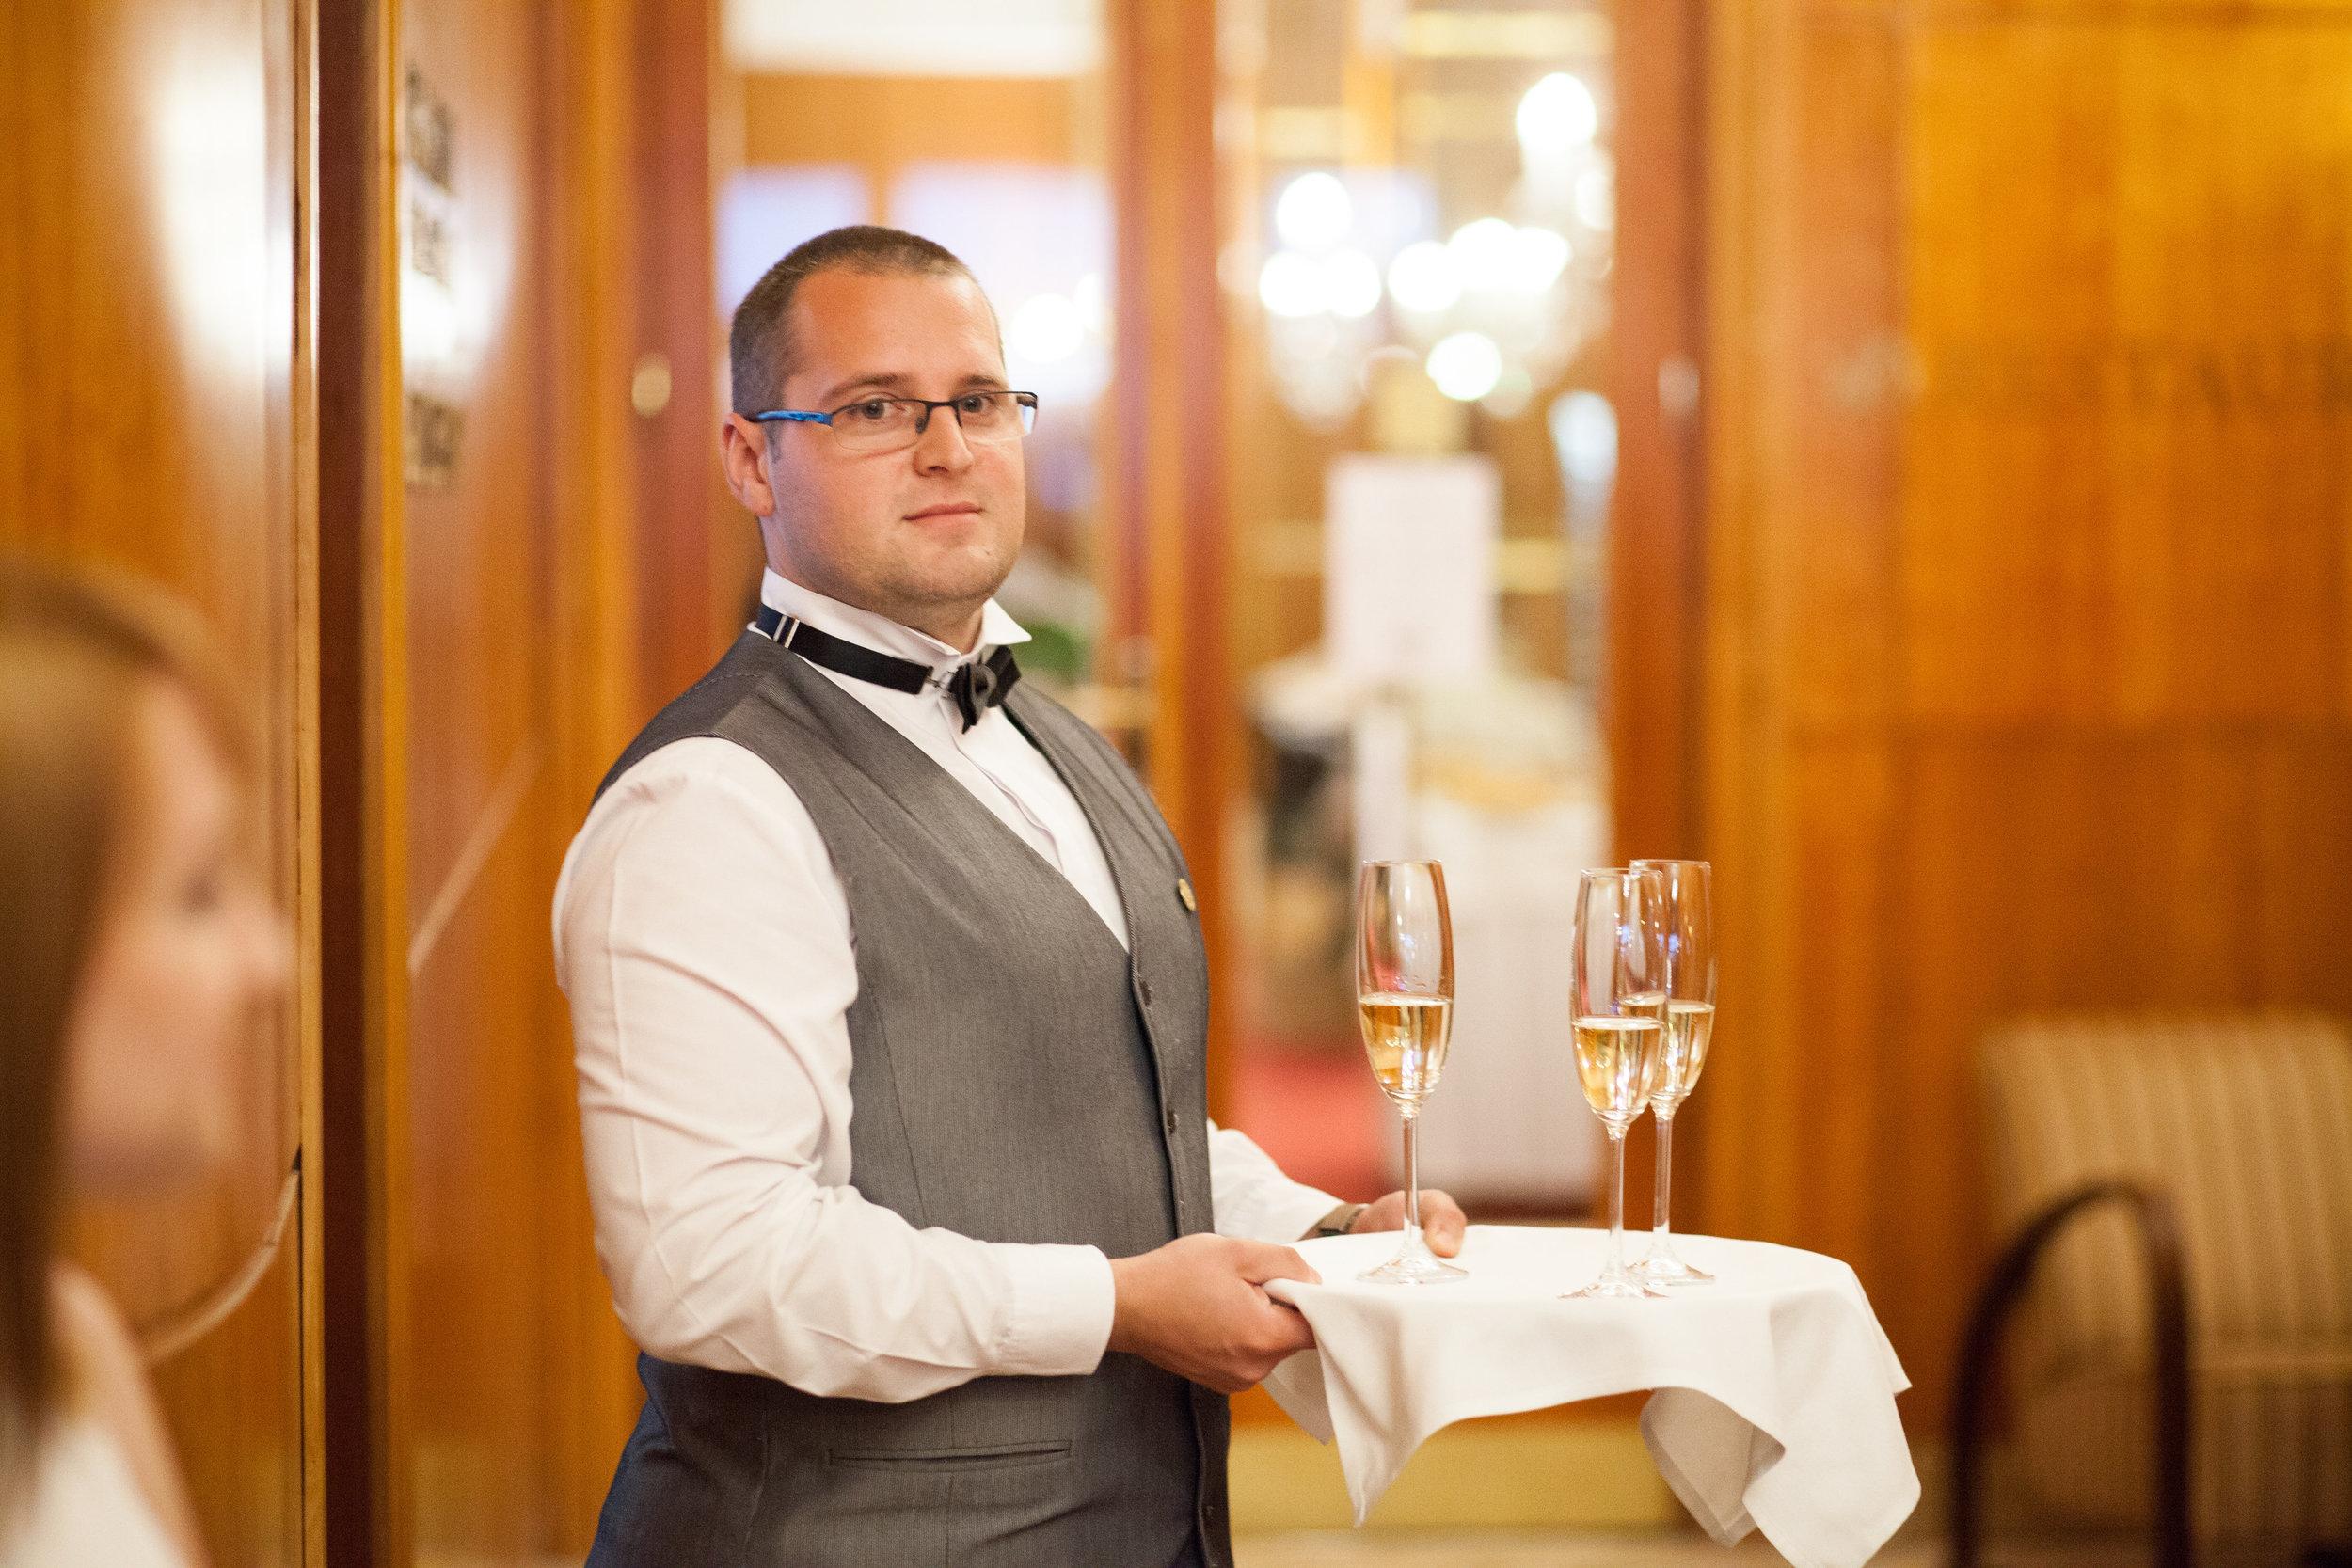 destination-wedding-photographer-slovakia-bratislava-reception-hotel-devin-6.jpg